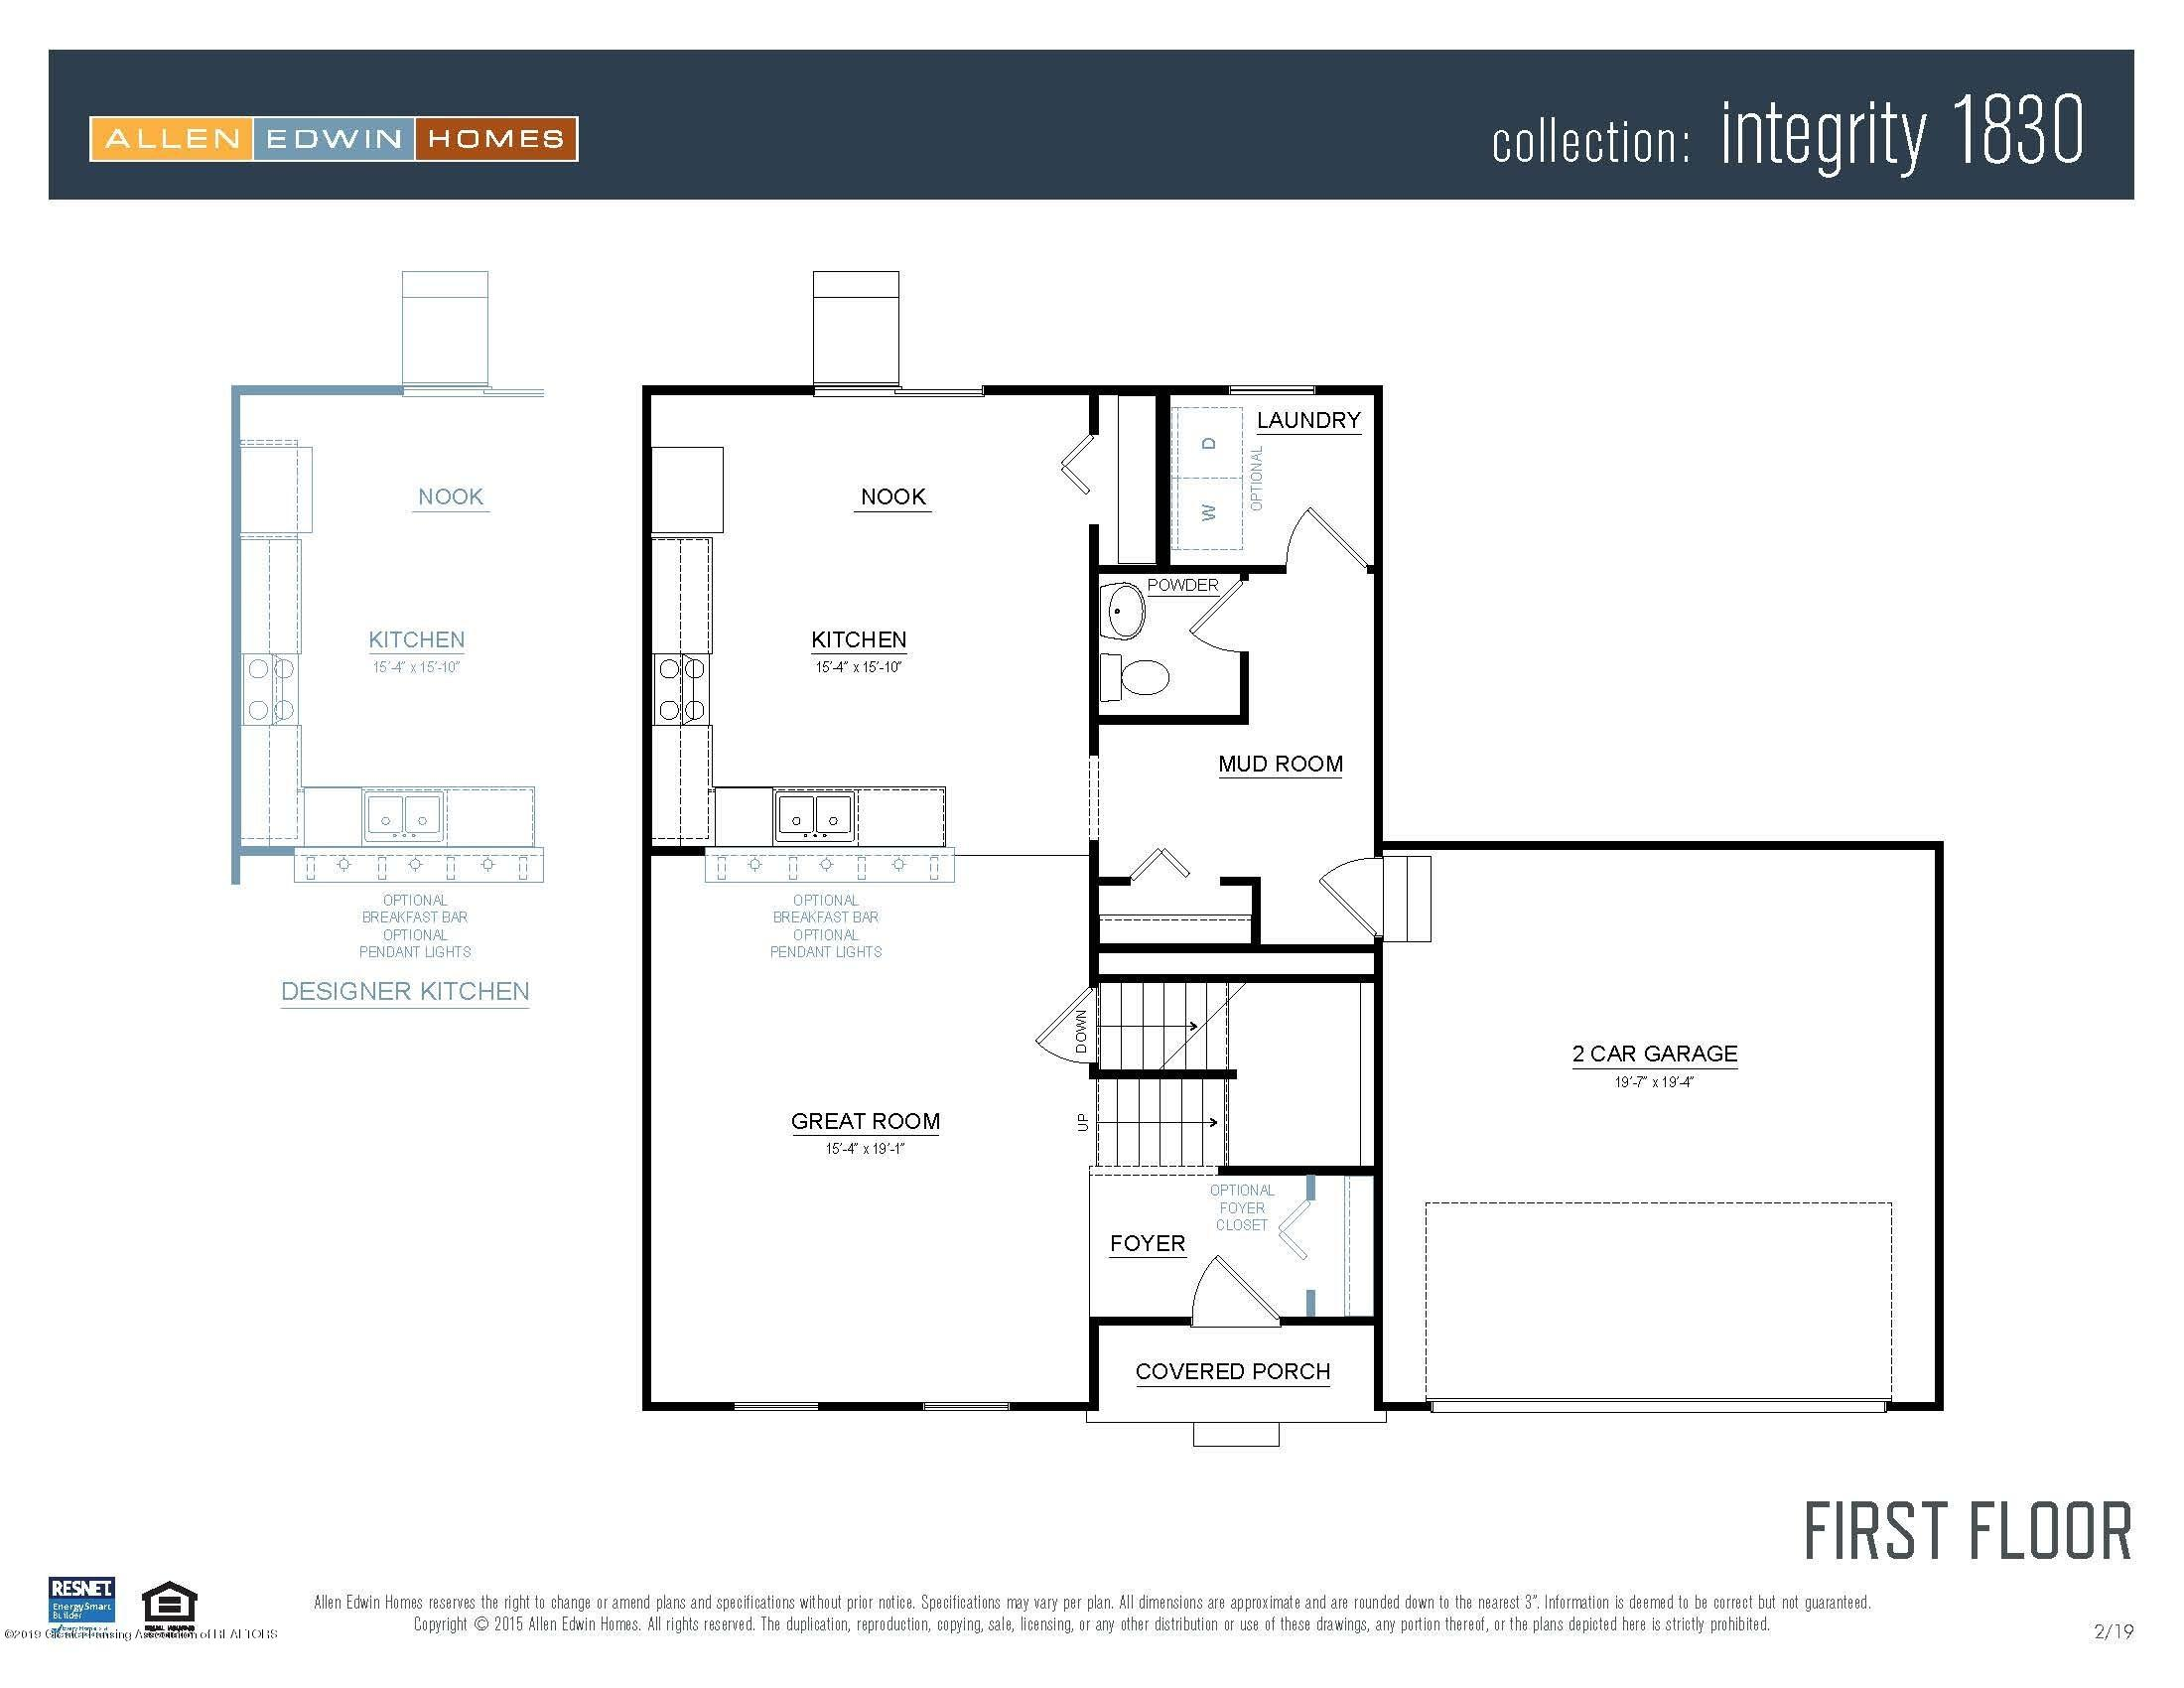 1125 River Oaks Dr - Integrity 1830 V8.1a First Floor - 3